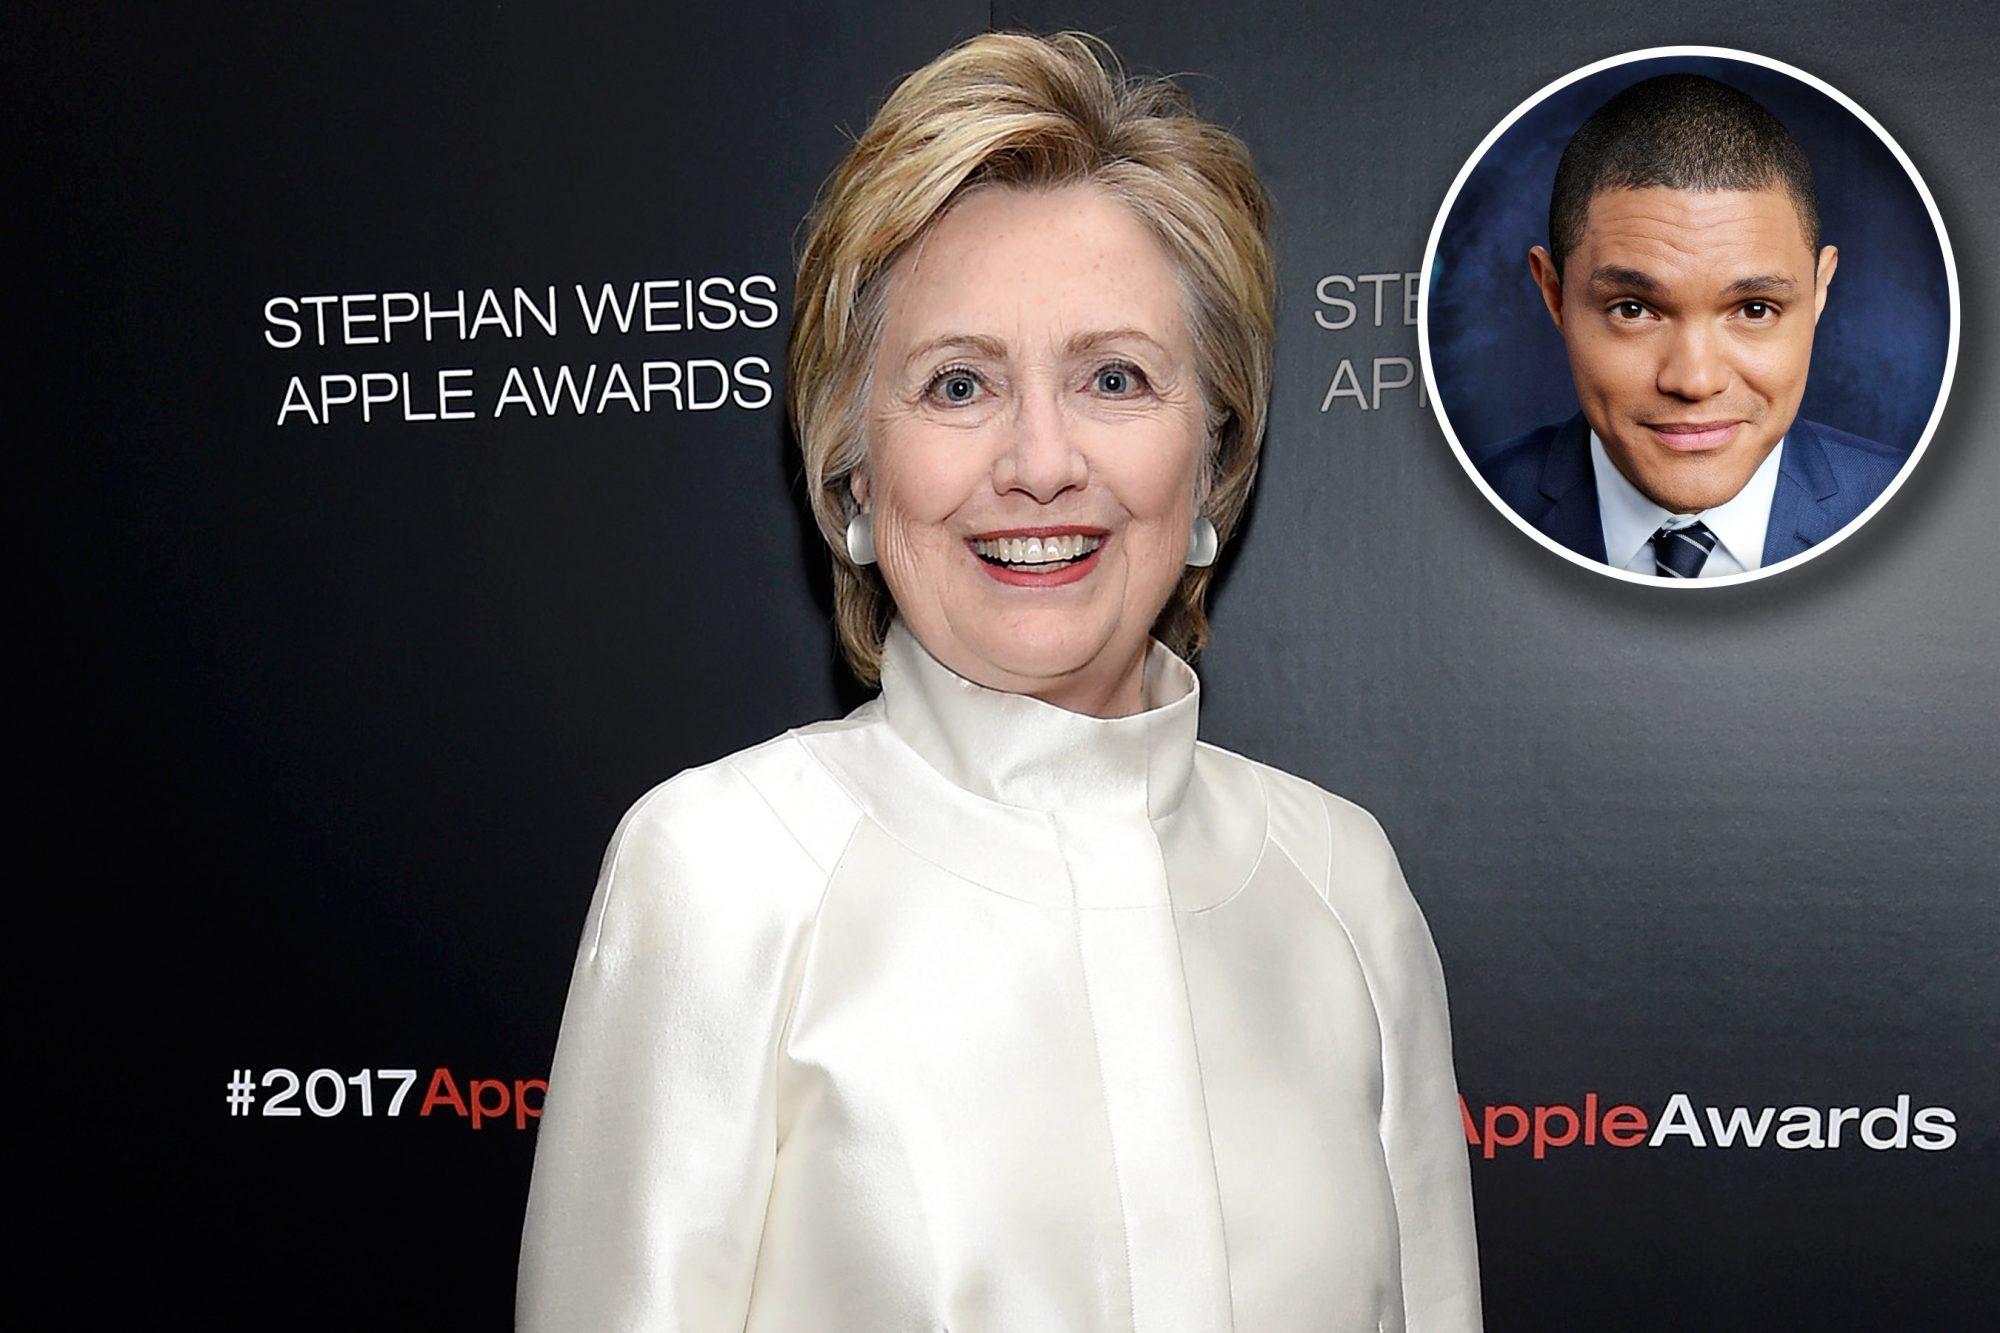 Hillary Clinton / Trevor Noah